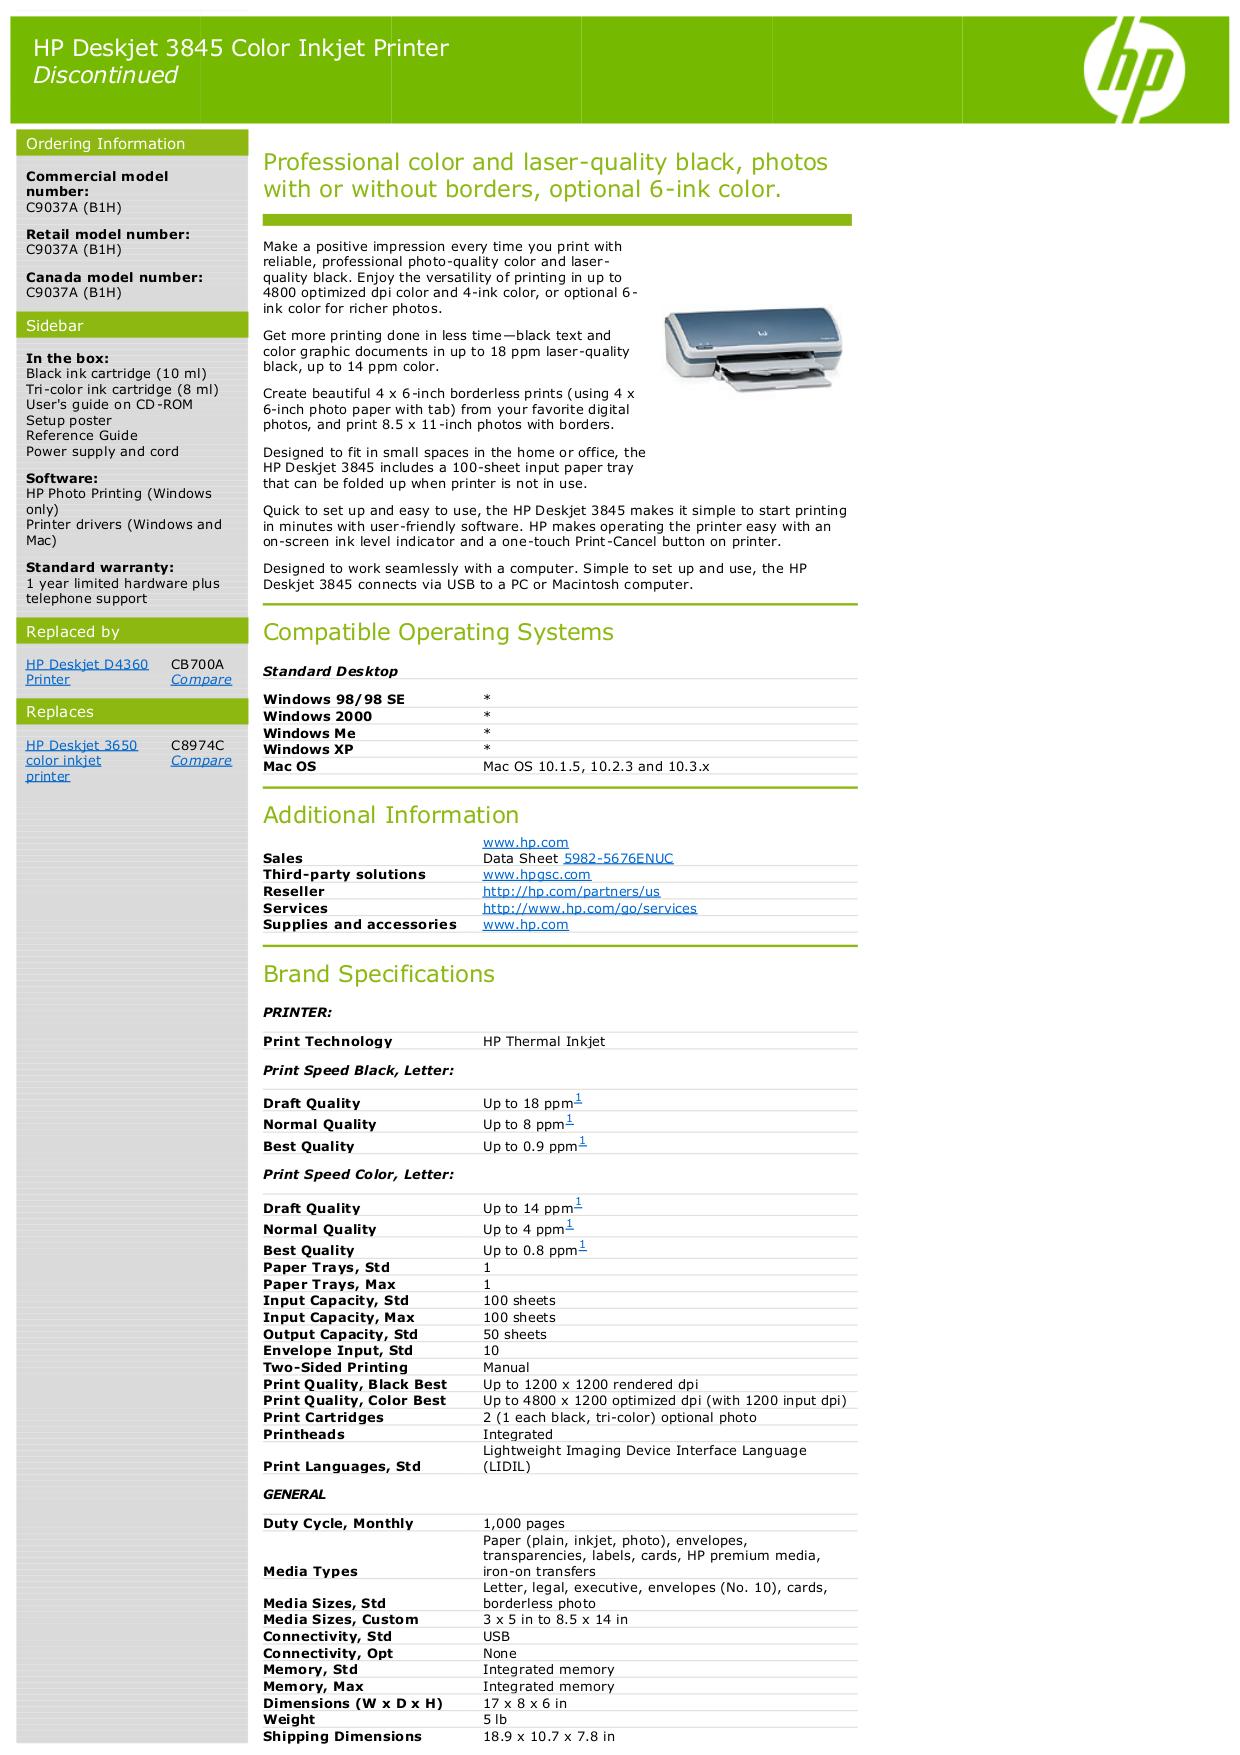 download free pdf for hp deskjet 3845 printer manual rh umlib com hp deskjet 3845 manual pdf hp deskjet 3845 service manual